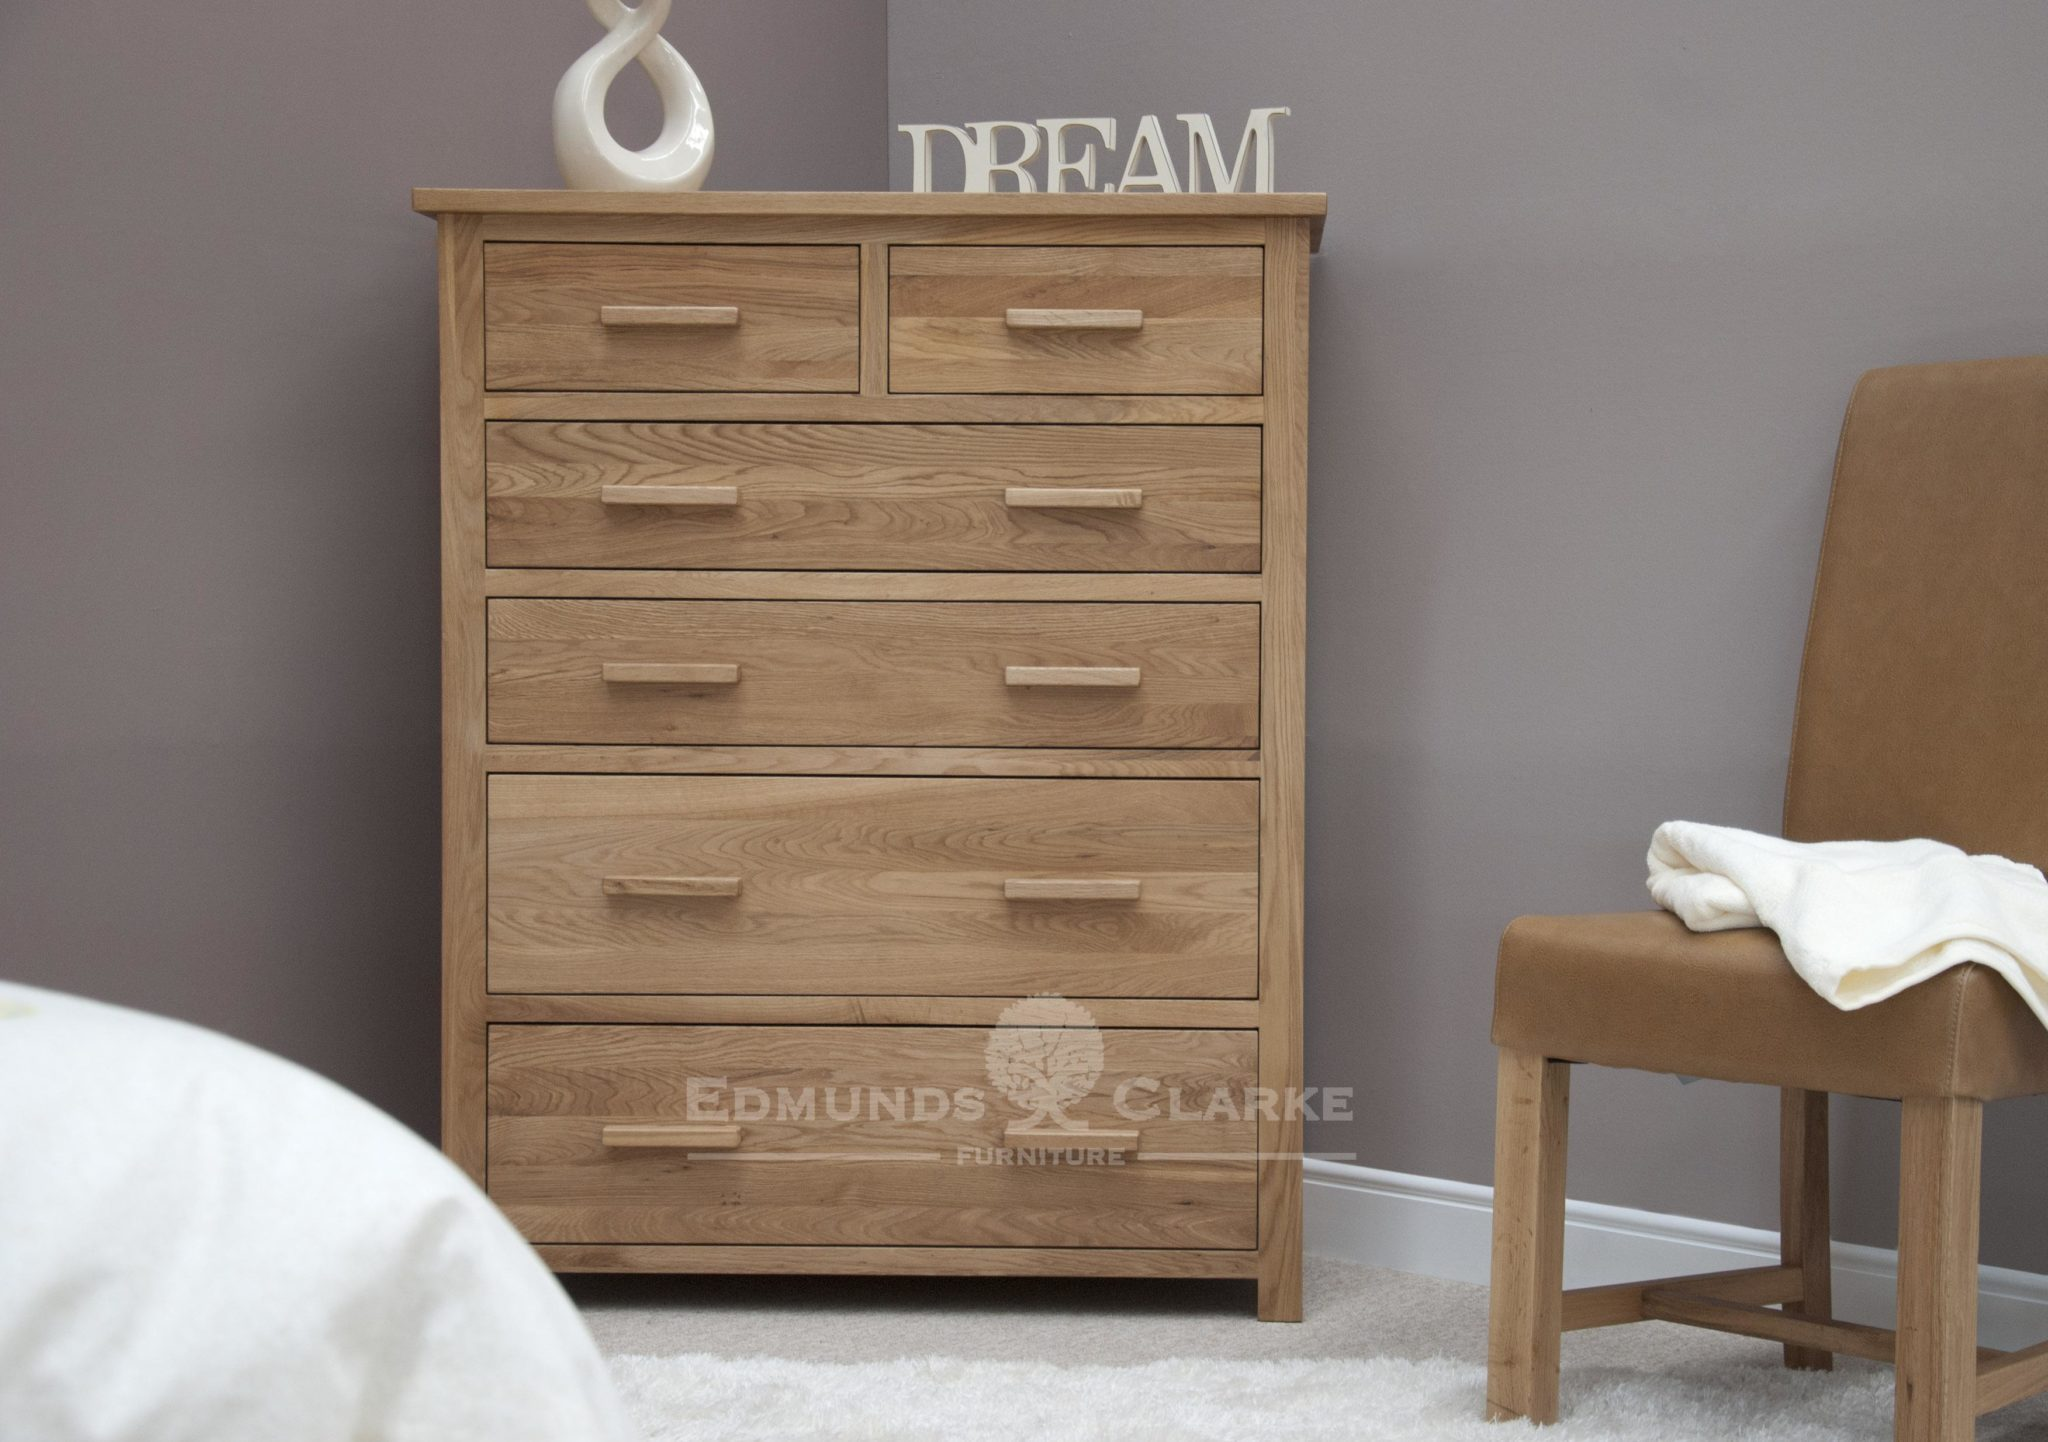 Bury solid oak large jumbo chest of drawers image shows oak bar handles.